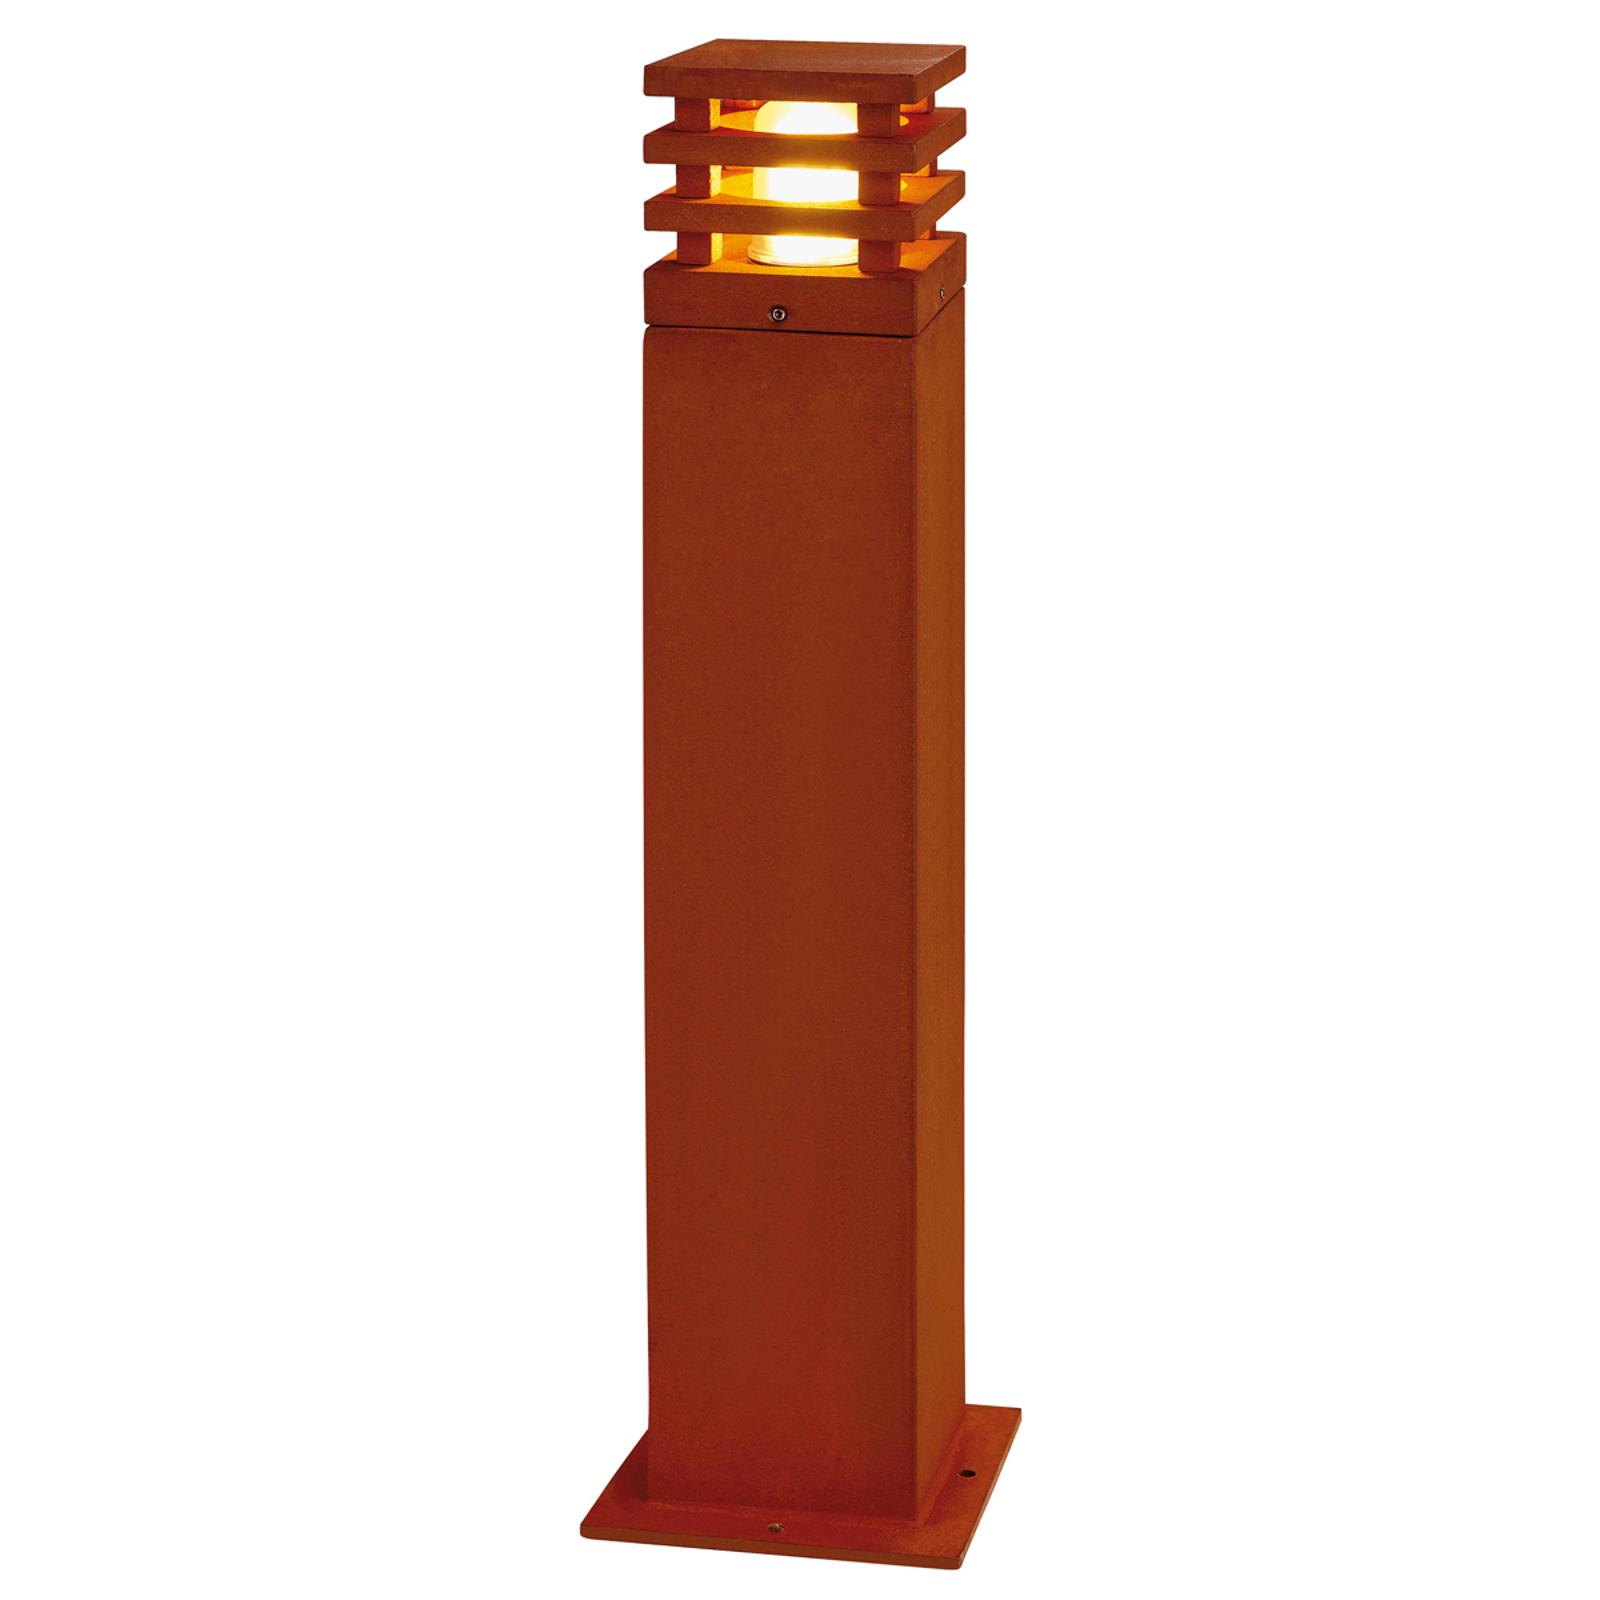 Rusty Square Path Light High-Quality_5502825_1